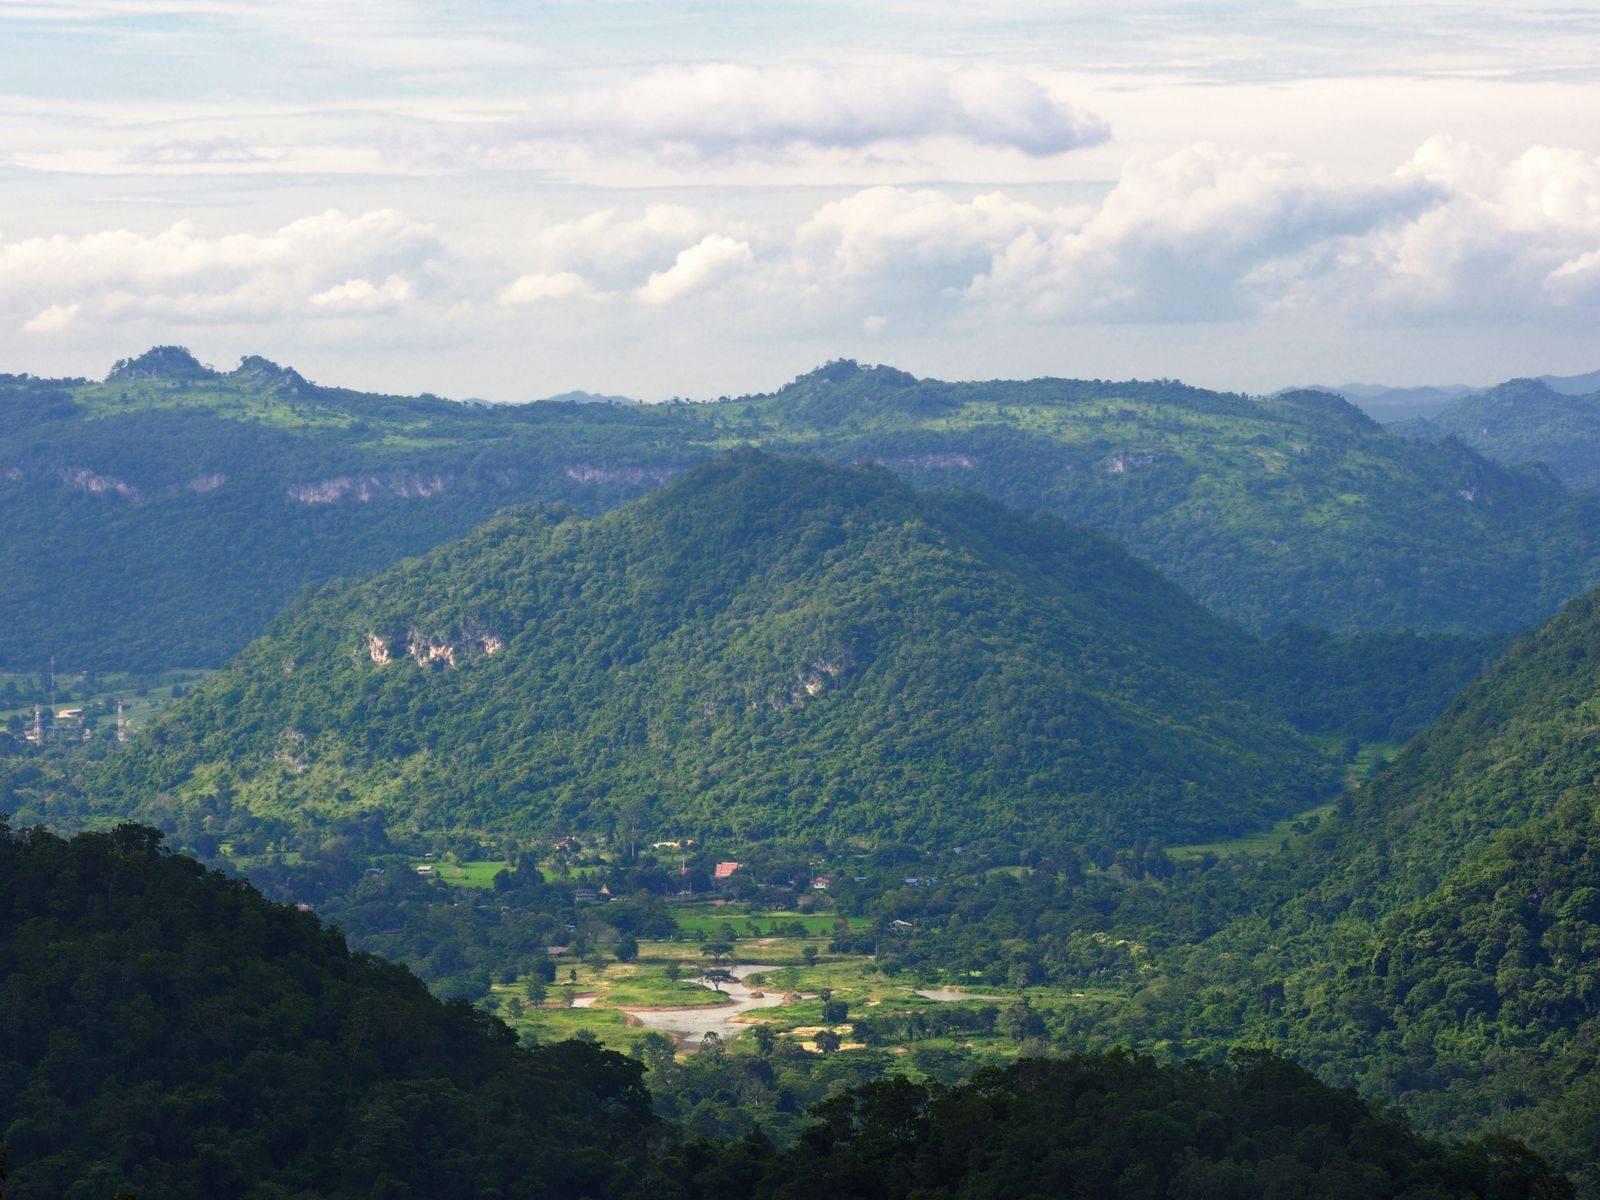 Khao Yai National Park and More